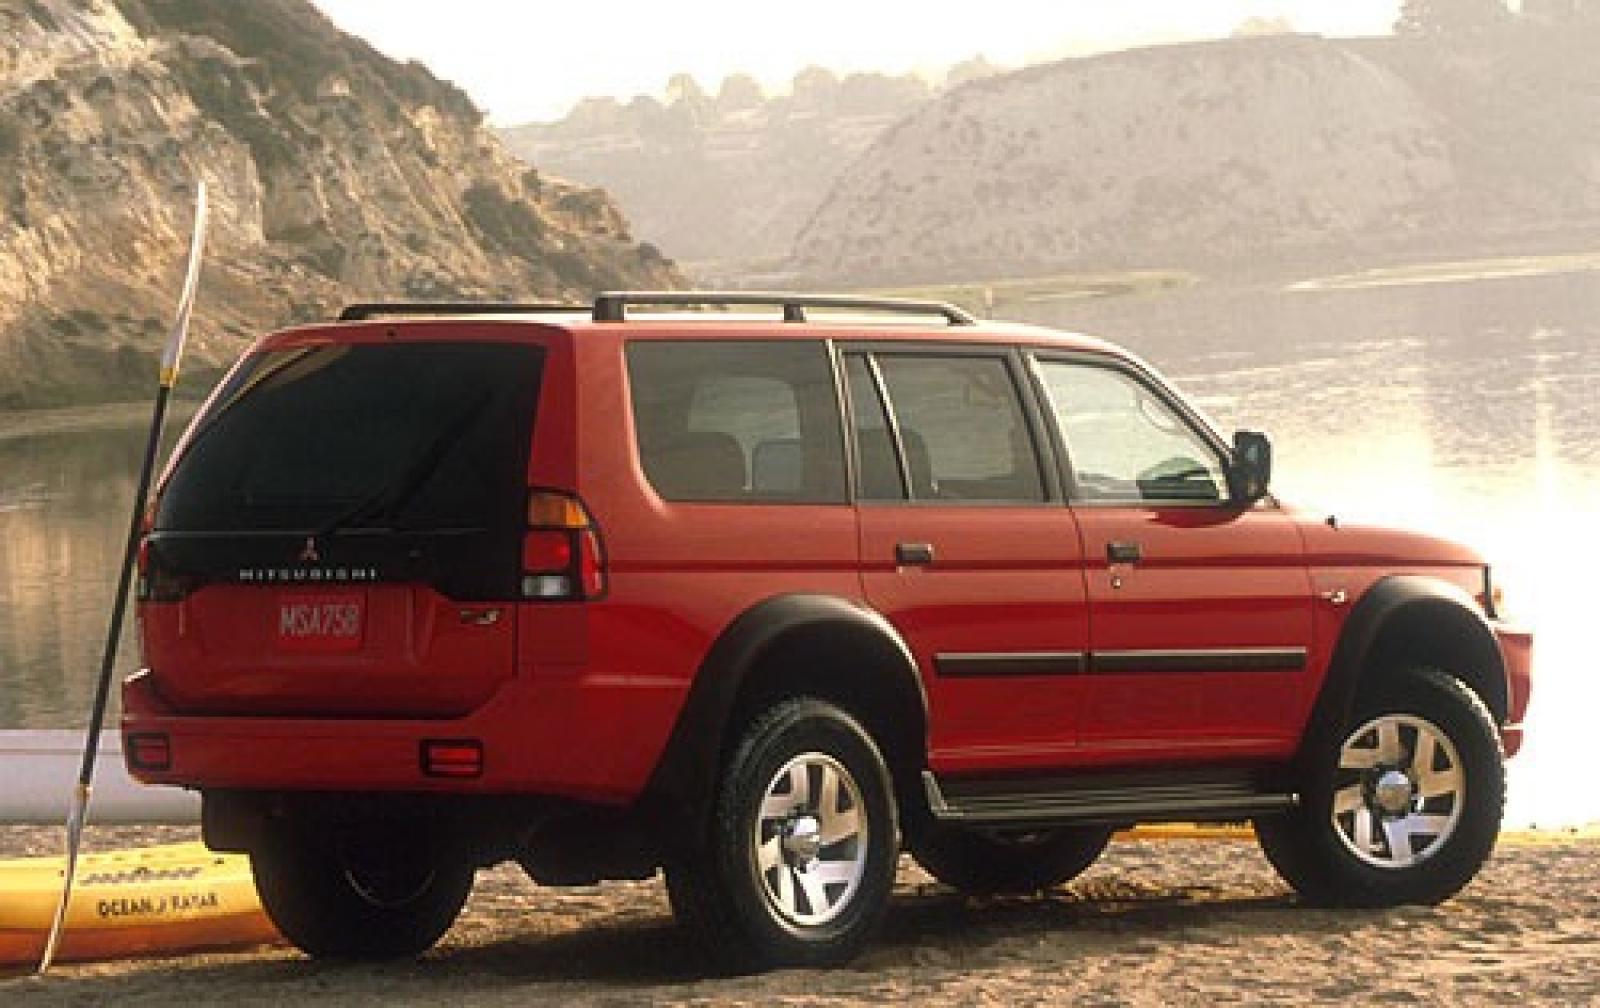 2001 Mitsubishi Montero Sport Information And Photos Zombiedrive 7 2002 S Interior 800 1024 1280 1600 Origin